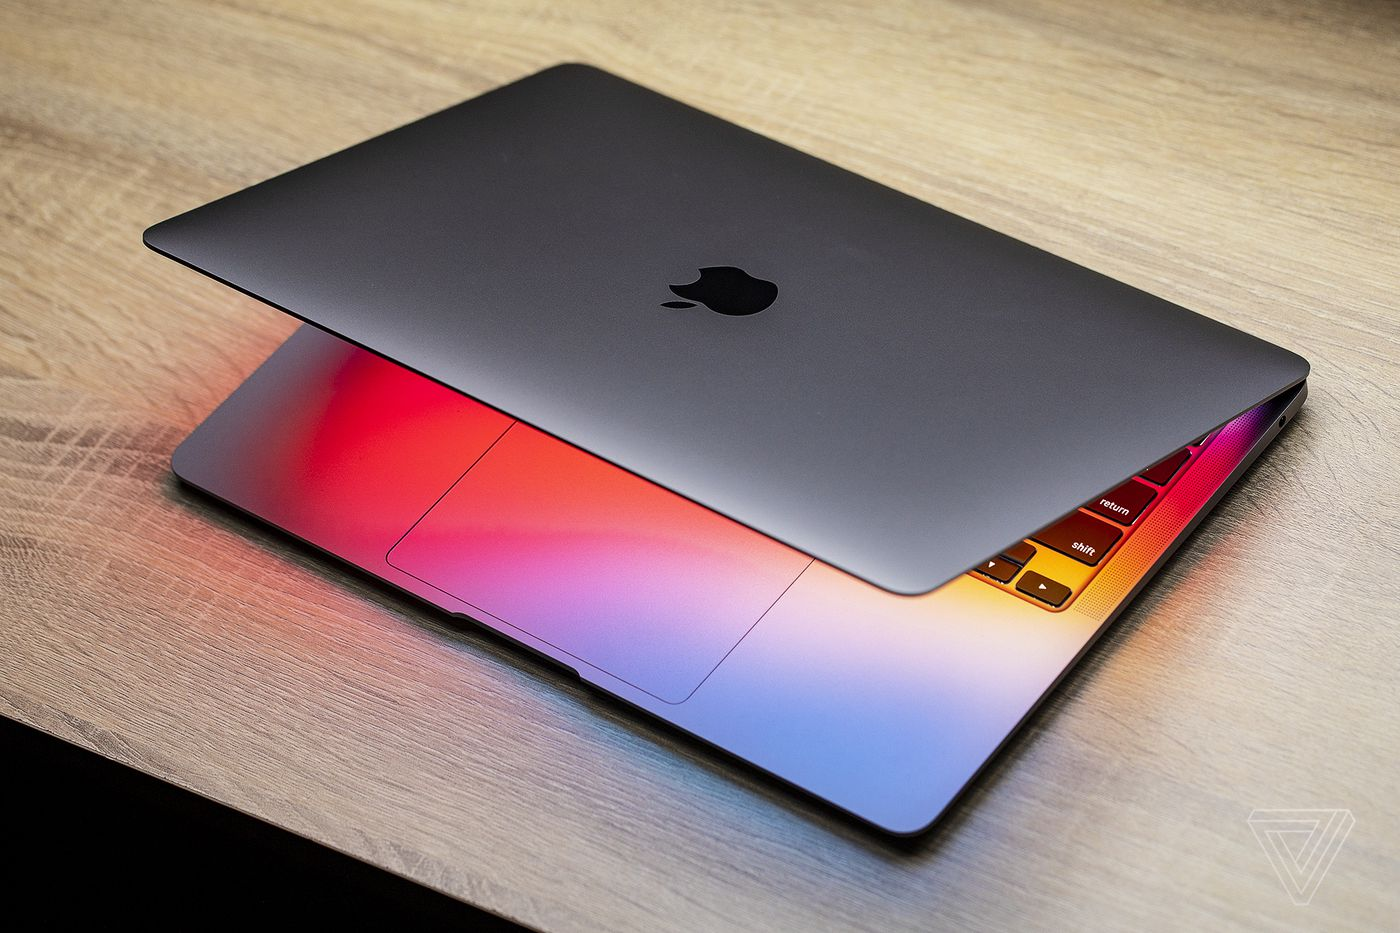 Apple's M1 chips